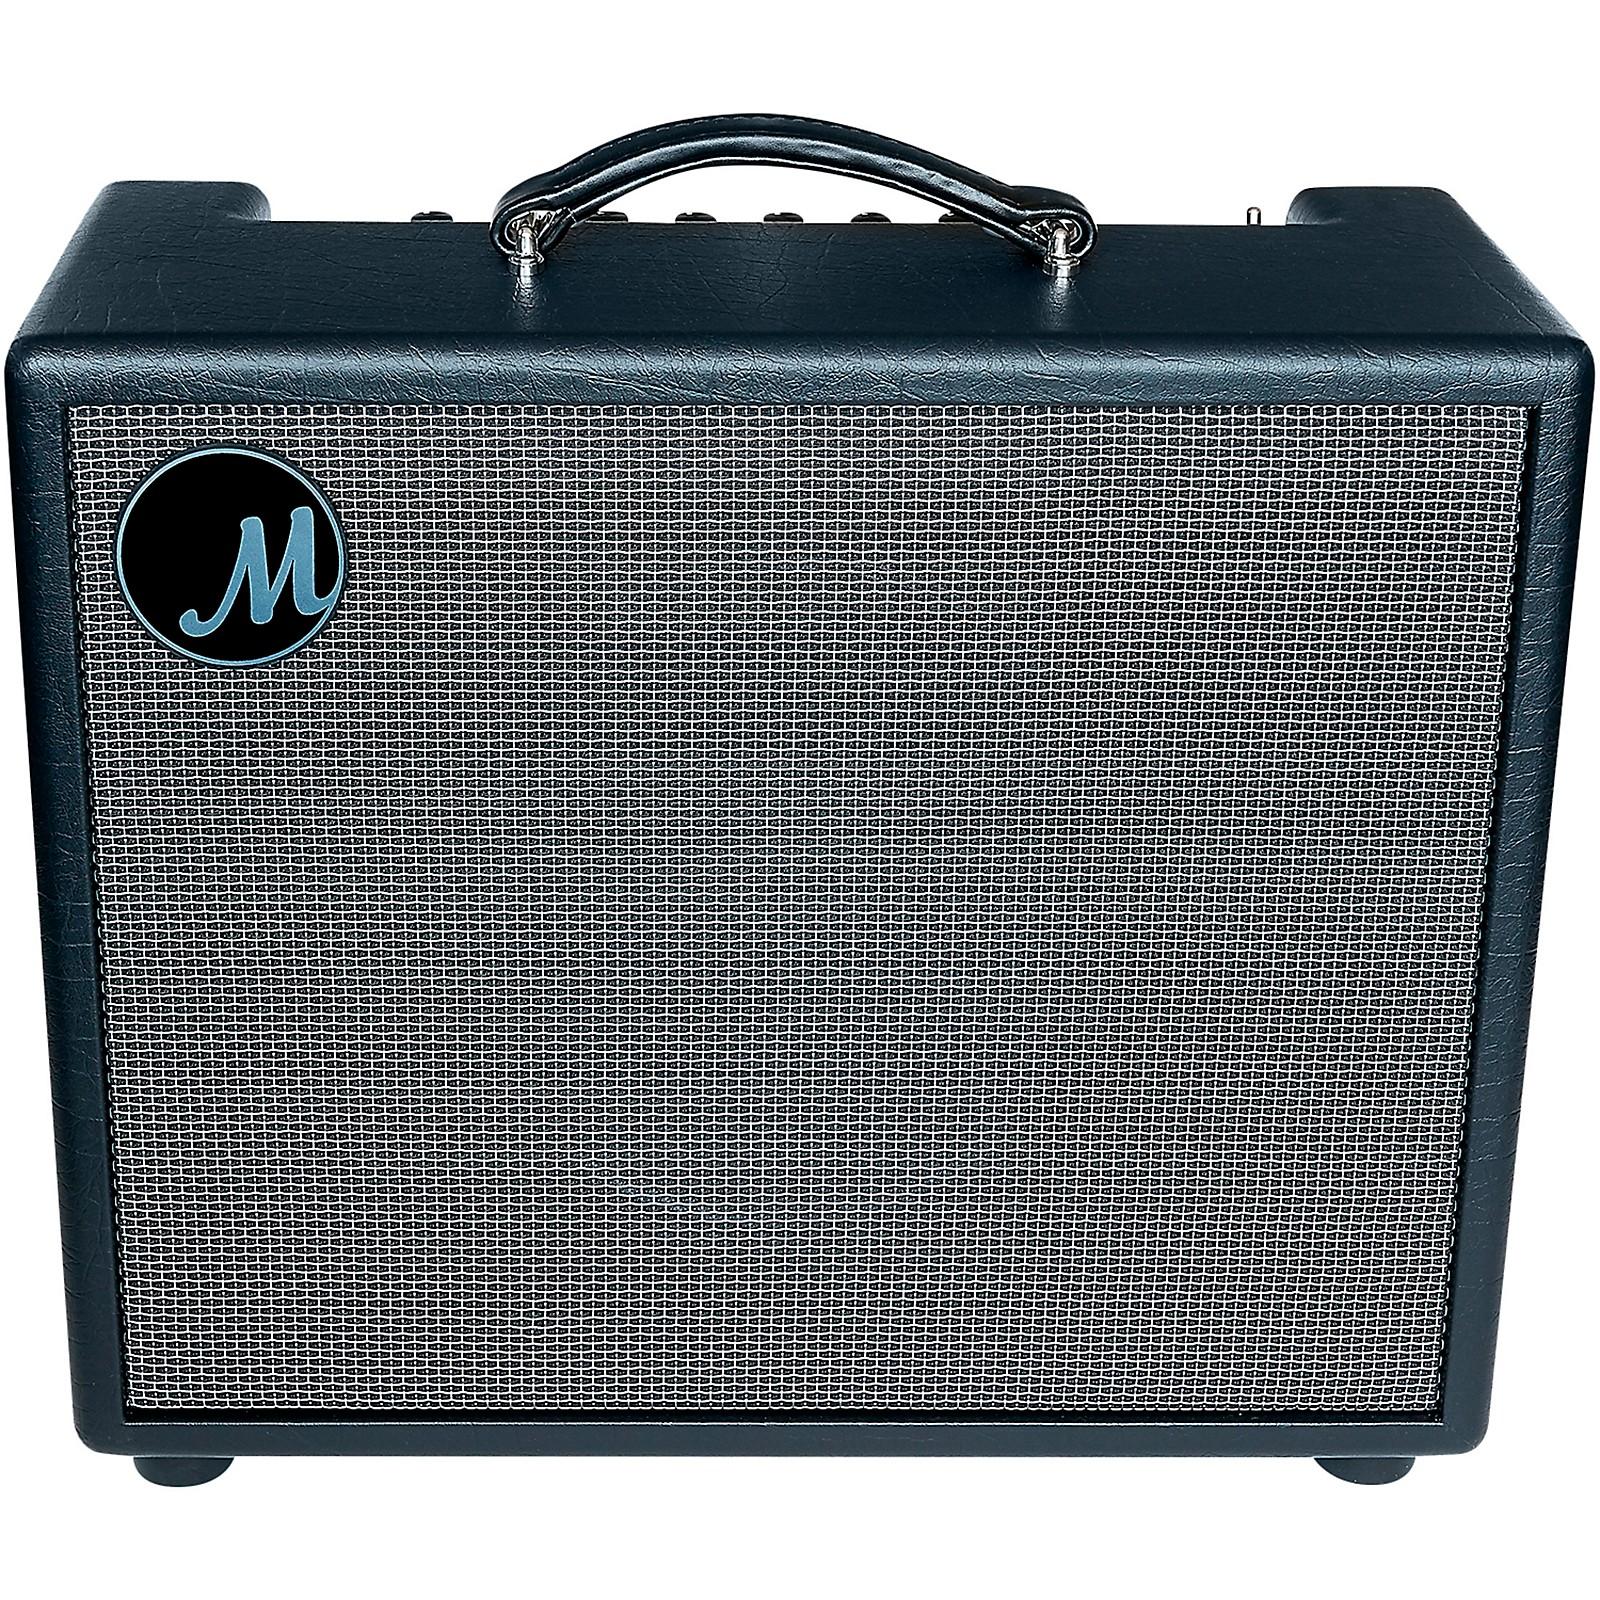 Open Box Milkman Sound The Amp 50W 1x12 Guitar Combo Amplifier